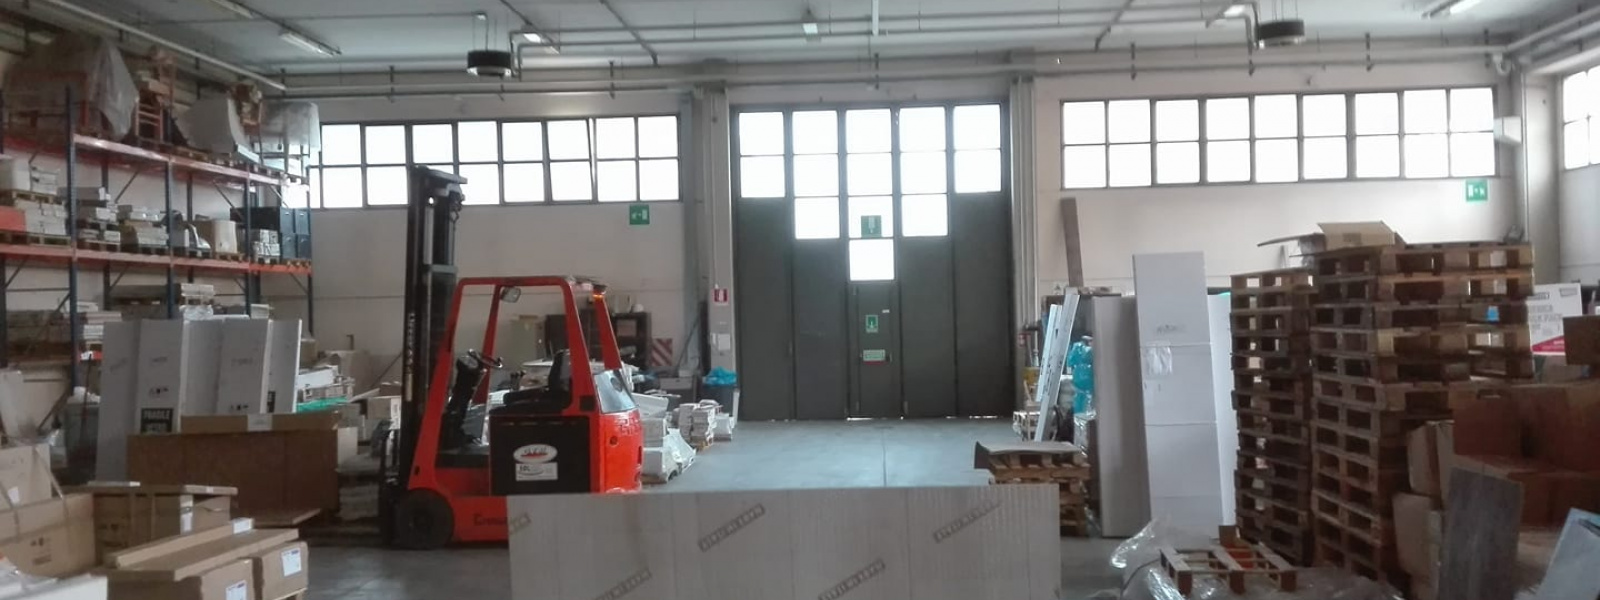 6 Stanze Stanze,3 BathroomsBathrooms,Capannone Industriale,In Affitto,1539